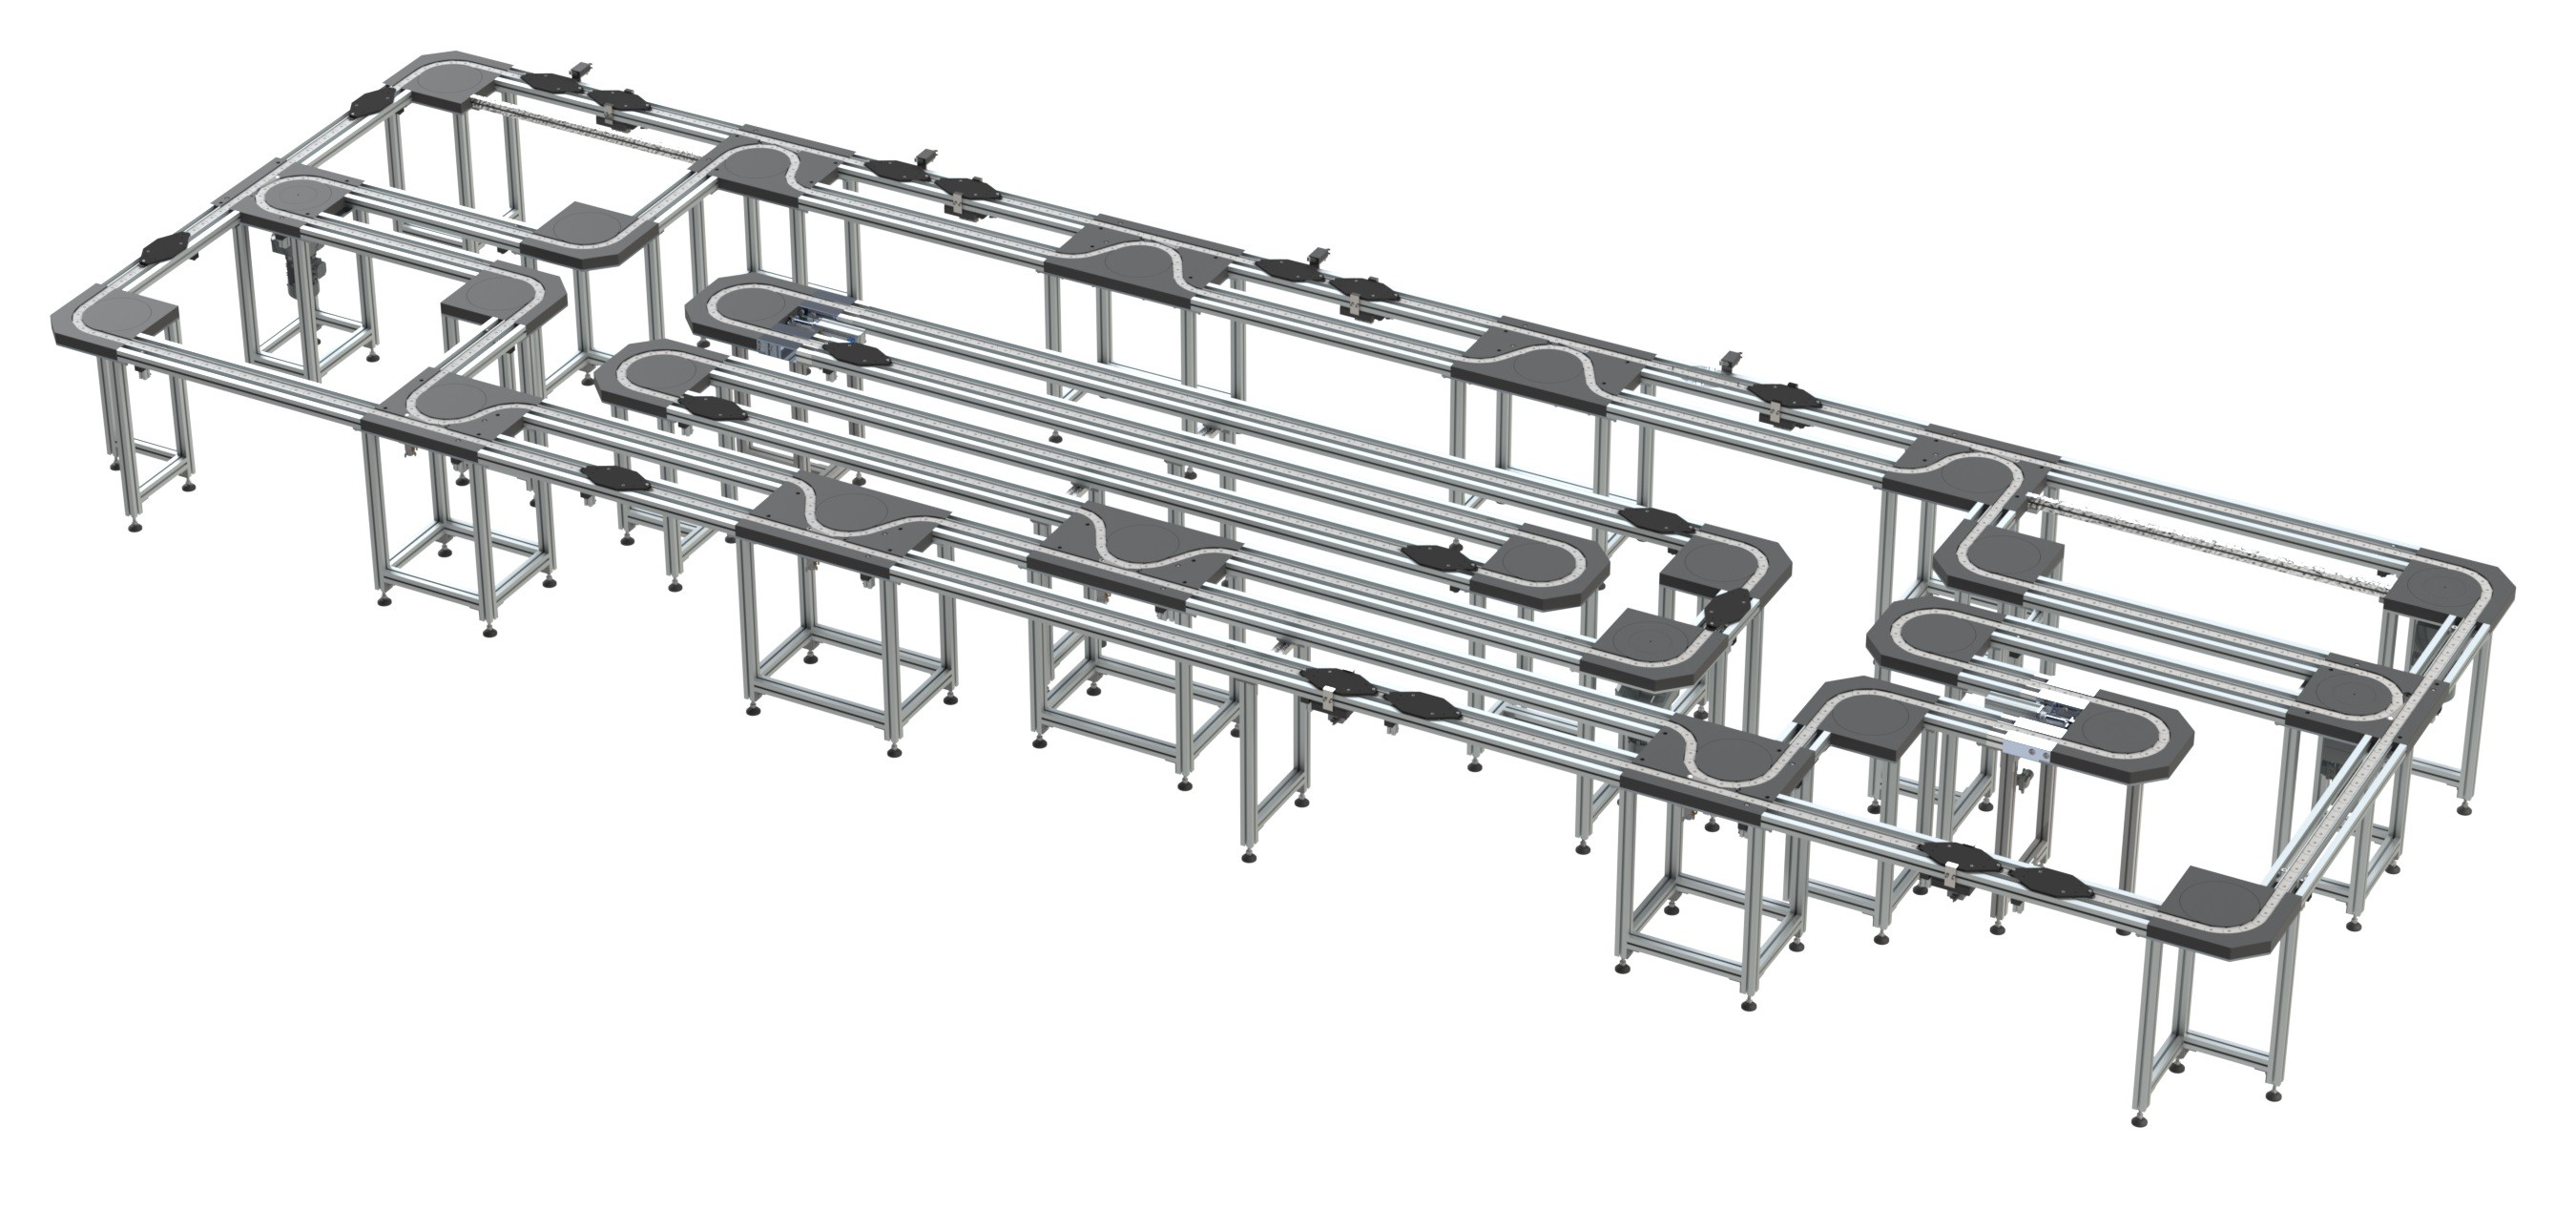 Transfersystem - Förderanlage - Automation - Zelle